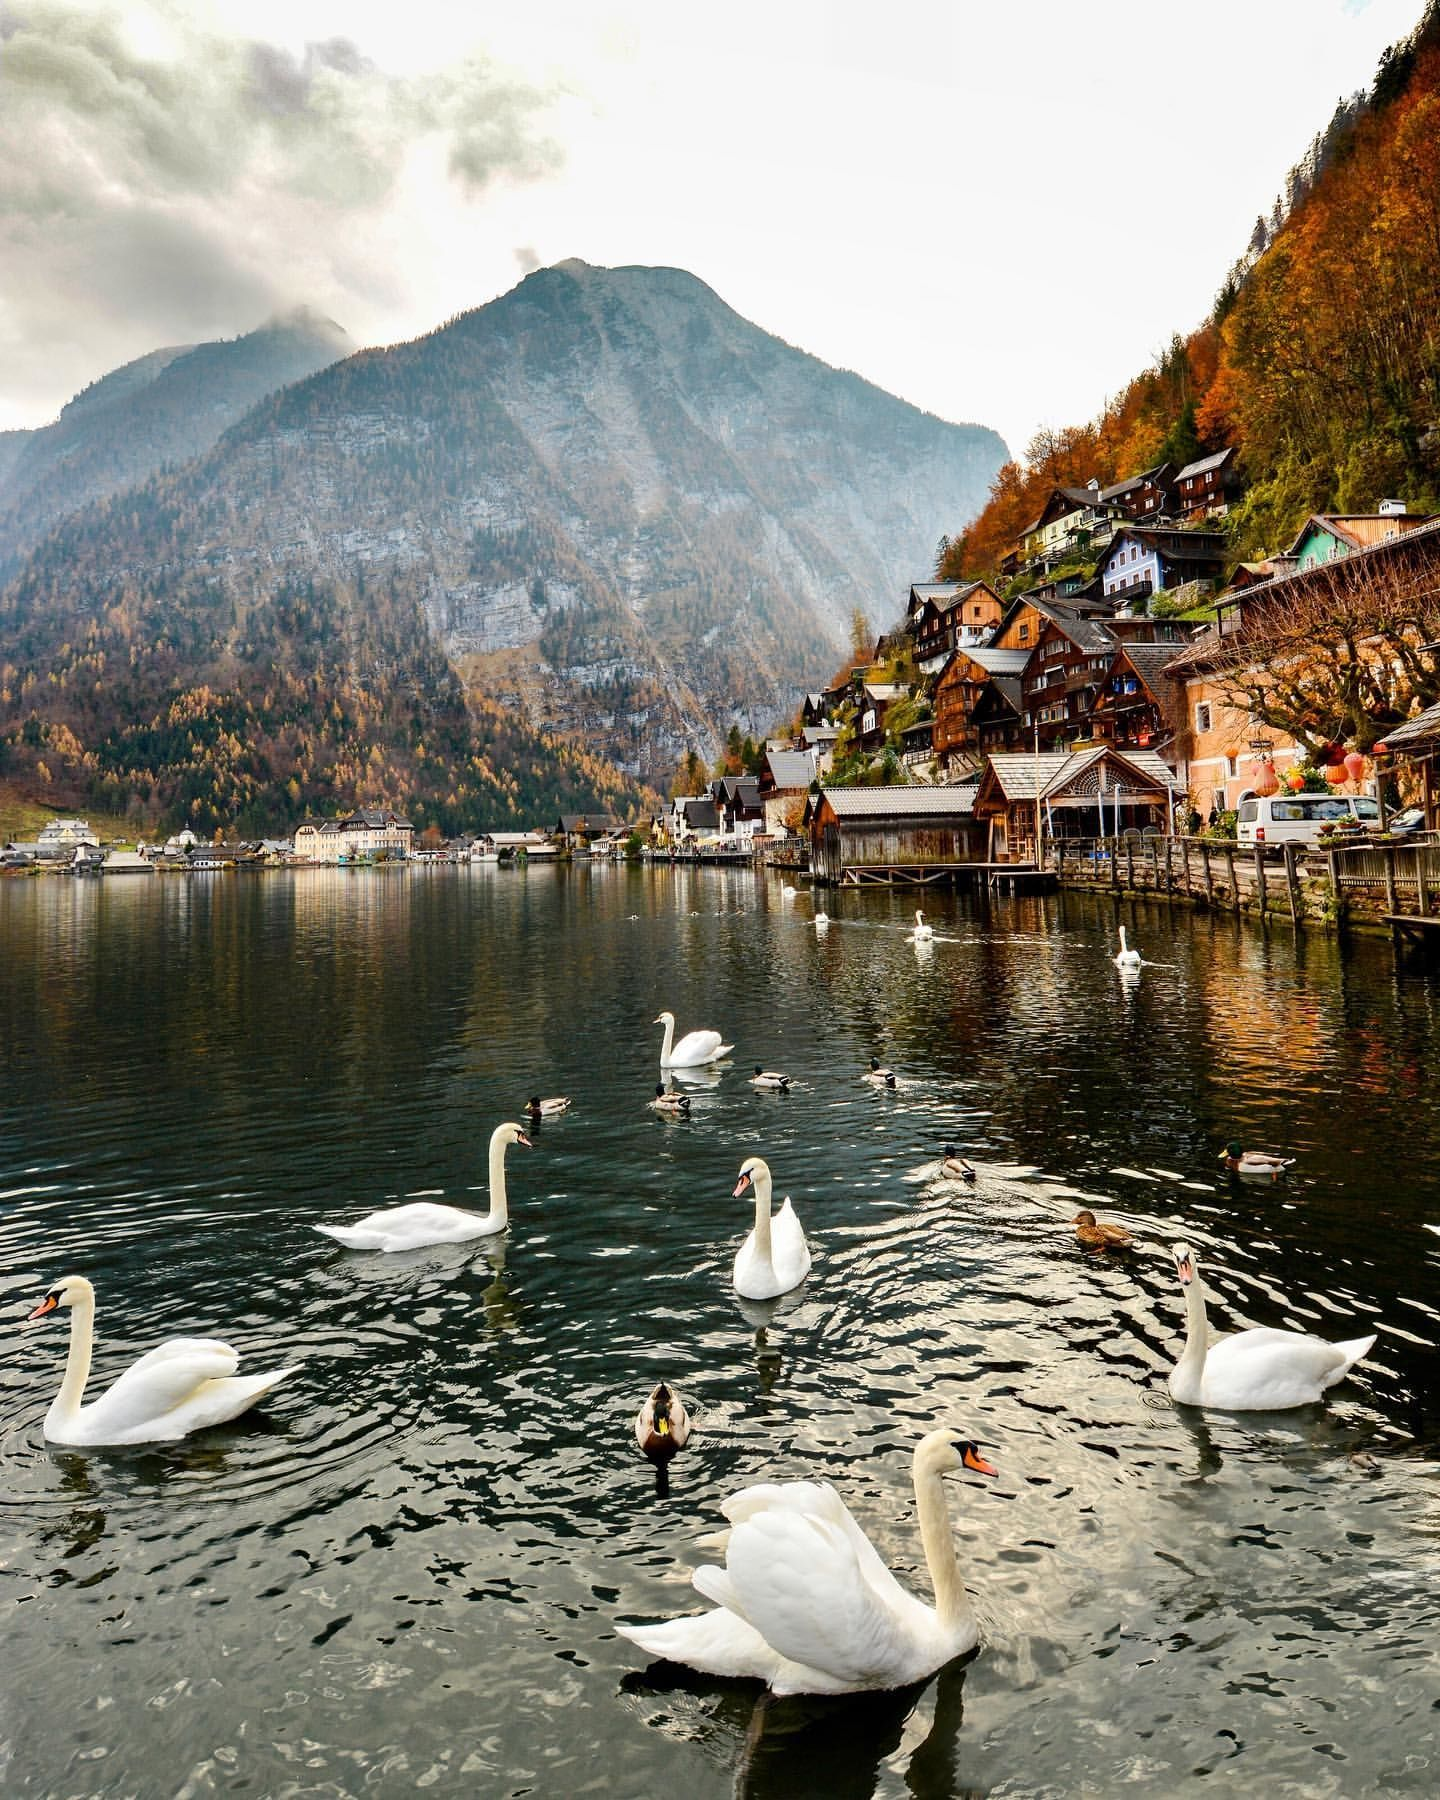 """You don't have to be rich to travel well."" – Eugene Fodor  . . Post by @wanderlust.rachel . . #hallstatt #austrianalps #austriatoday #austrianblogger #austriagram #nikonphotography #europe_pics #europe_ig #europe_photogroup #dnescestujem #globetrotter #tasteintravel #timeoutsociety #mytinyatlas #gltlove #travelcommunity #seetheworld #roamtheplanet #igworldclub #sidewalkerdaily #traveltagged #lifewelltravelled #earthpix #earth_pix #fallphotography #autumnvibes #autumncolours"